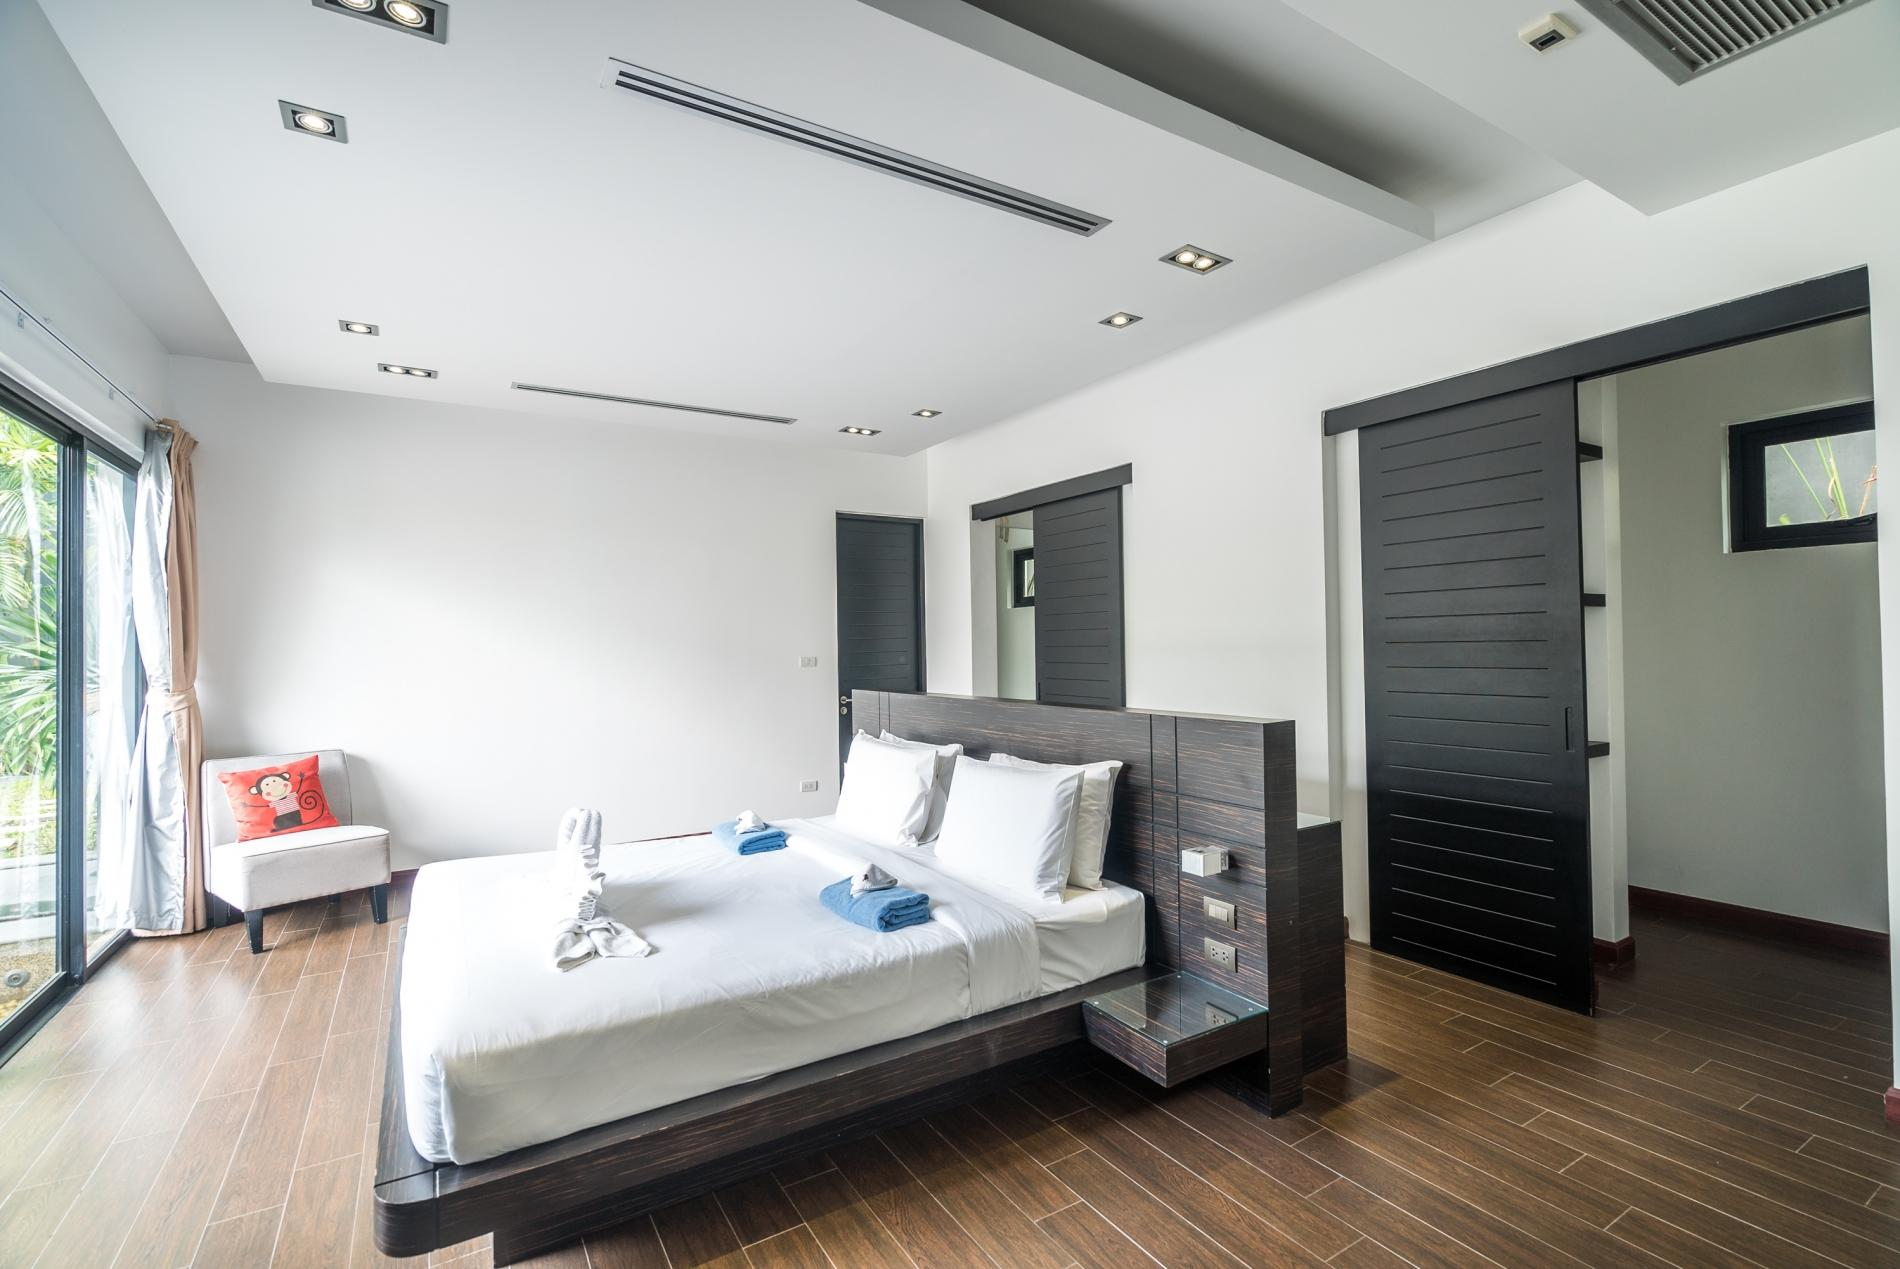 Apartment Diamond 272 - Modern 4 br private pool and garden villa photo 20320658